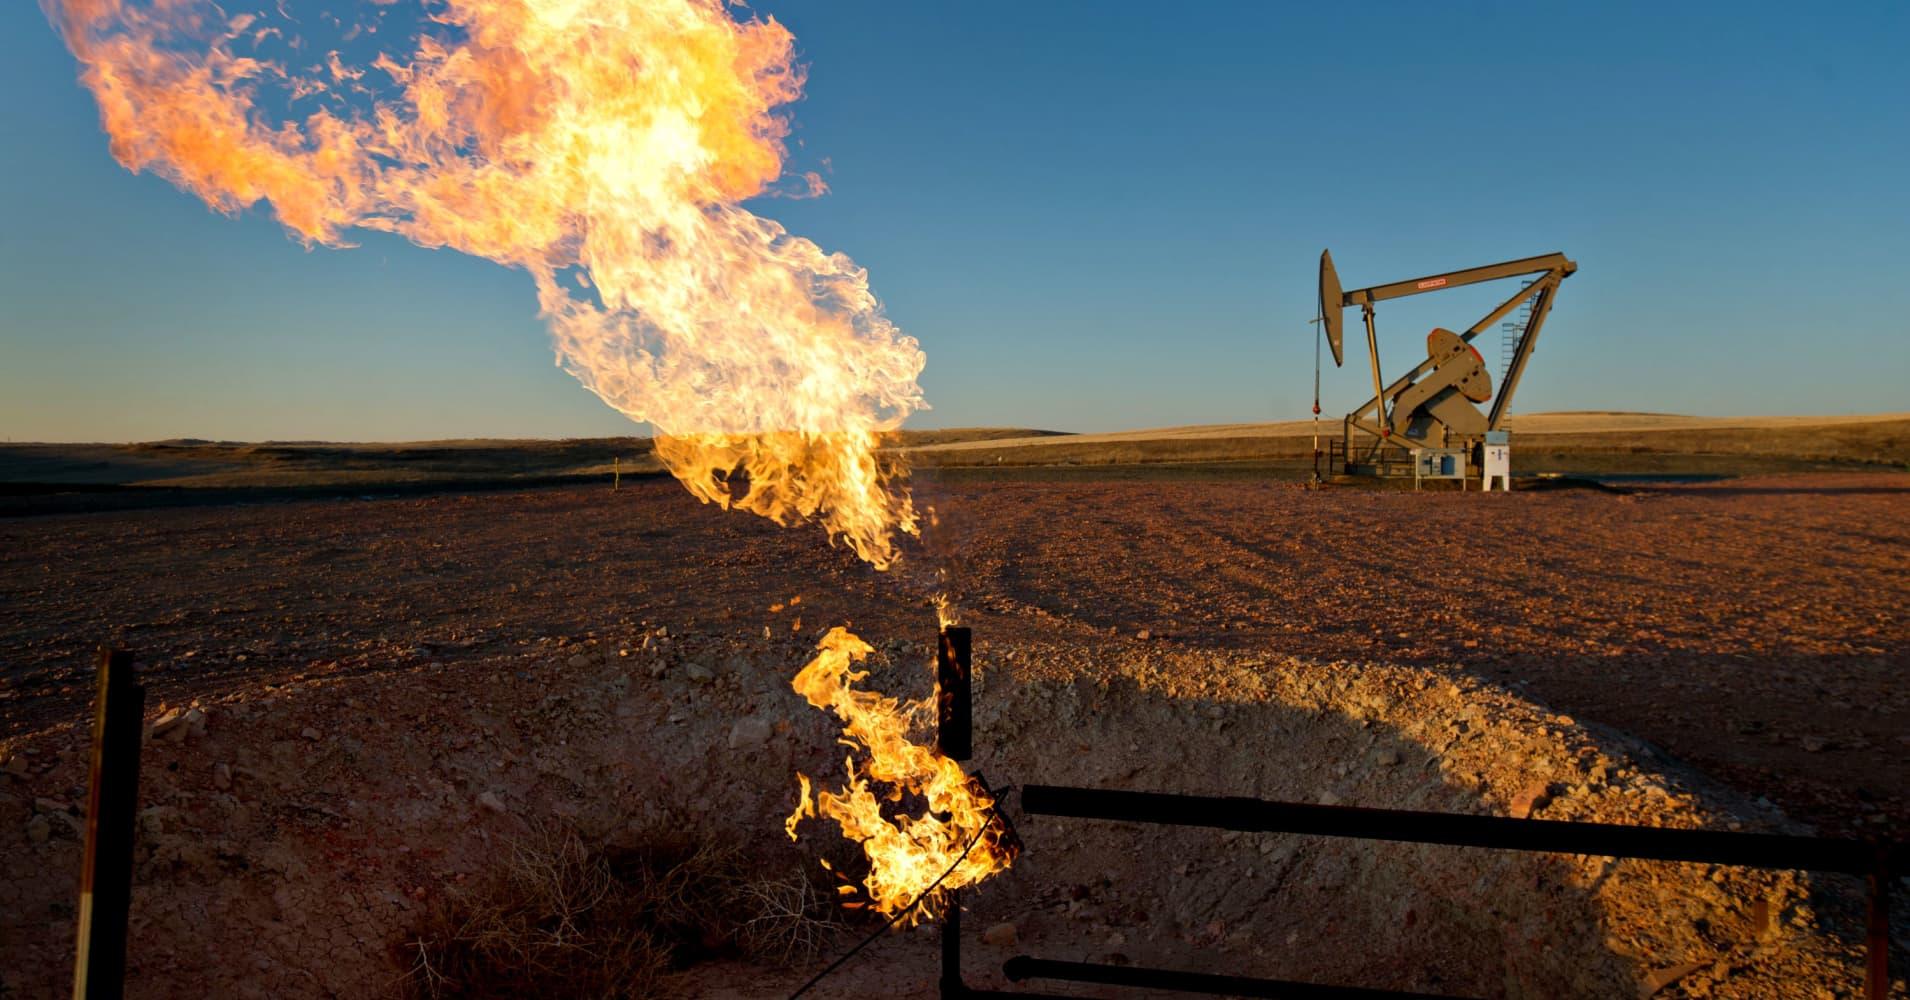 The oil market 'fever' pushing prices toward $100 won't break soon